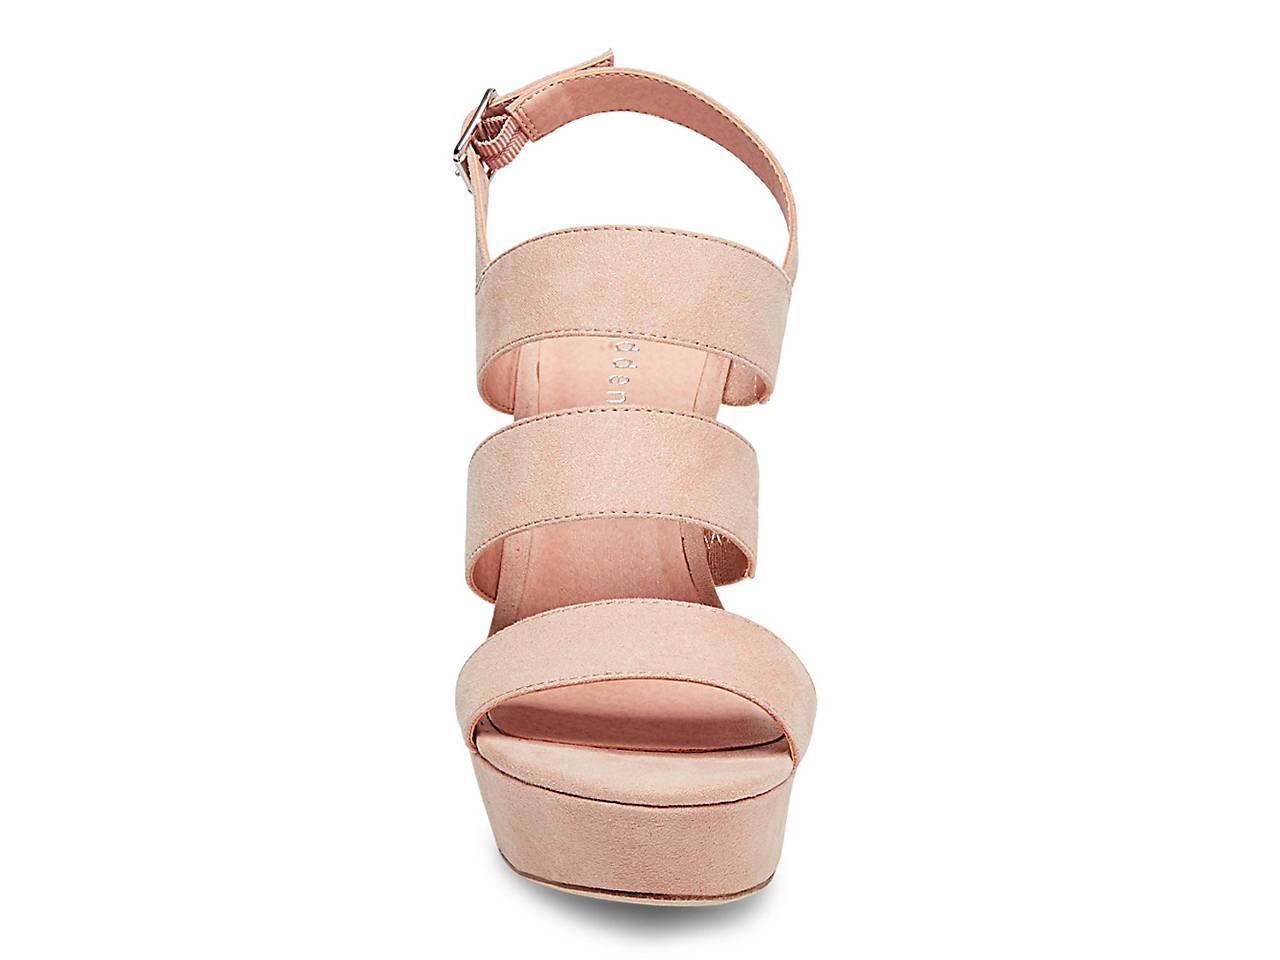 6e507f8a6a1 Madden Girl Blenda Wedge Sandal Women s Shoes